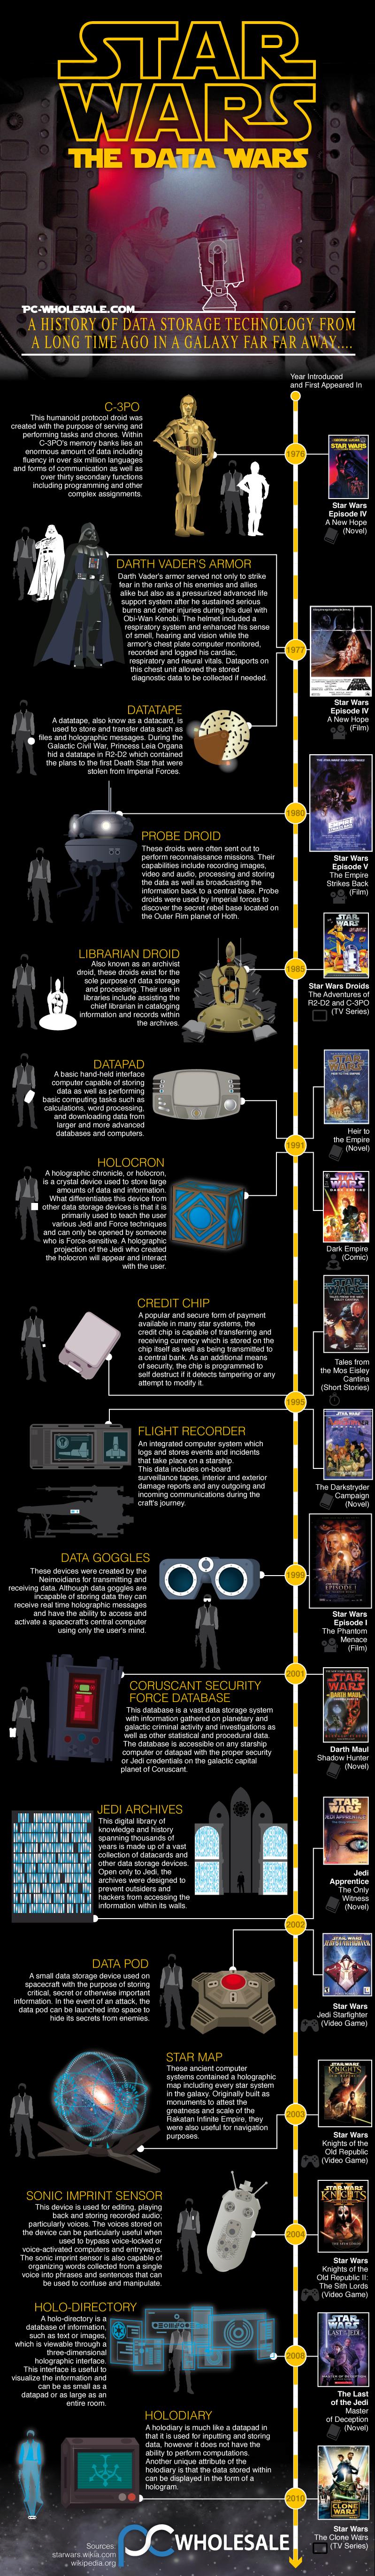 Star Wars: The Data Wars